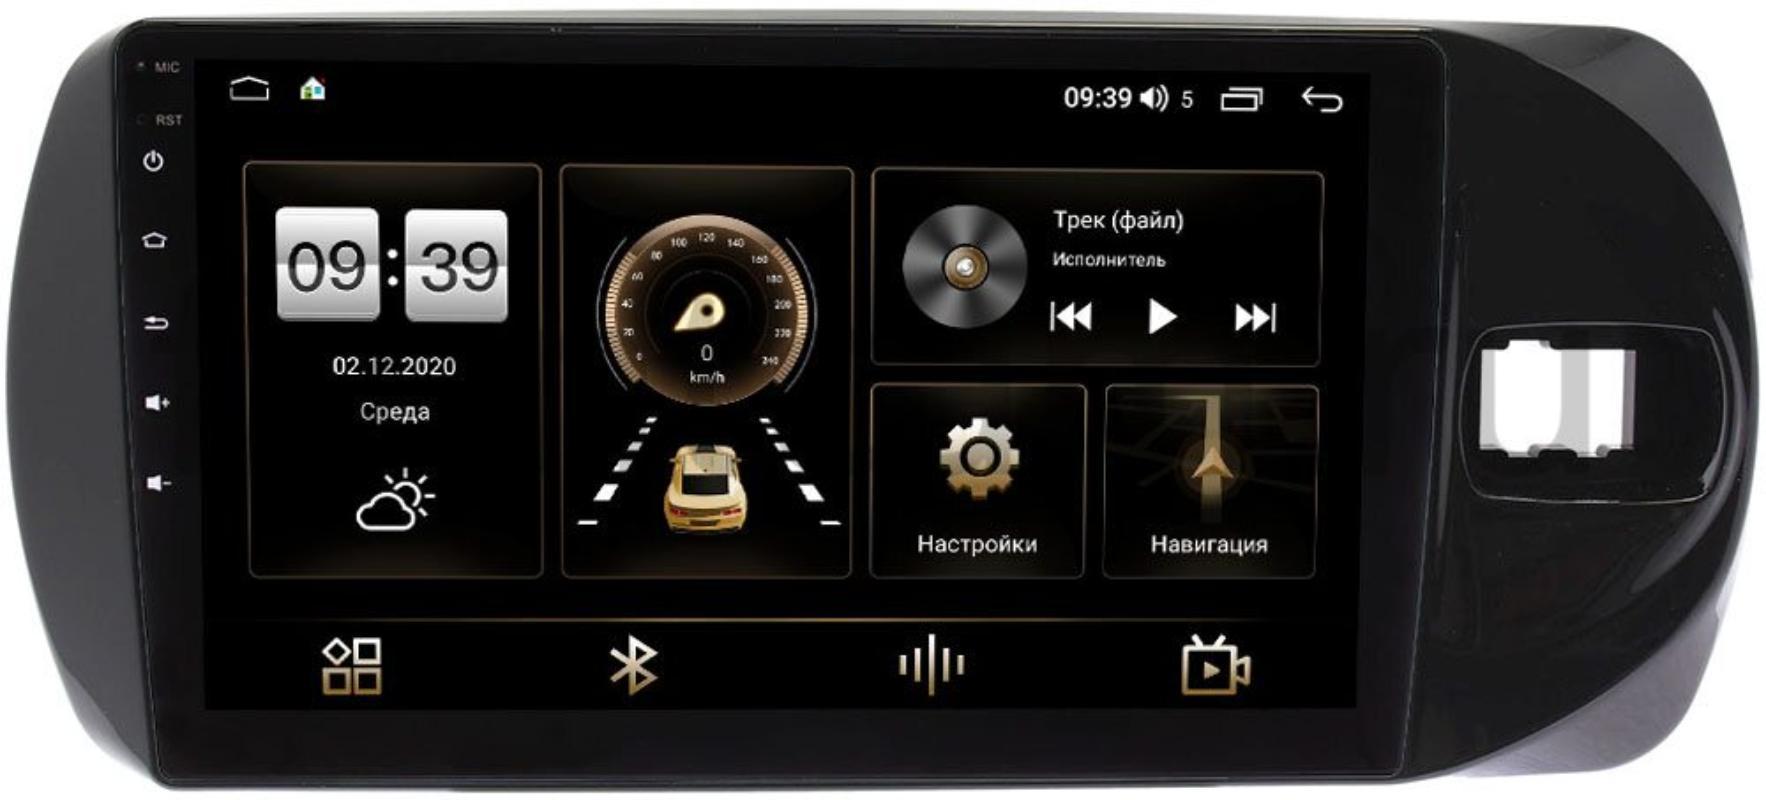 Штатная магнитола LeTrun 4166-9-TO385N для Toyota Vitz III (XP130) 2014-2019 (Тип 1) на Android 10 (4G-SIM, 3/32, DSP, QLed) (+ Камера заднего вида в подарок!)